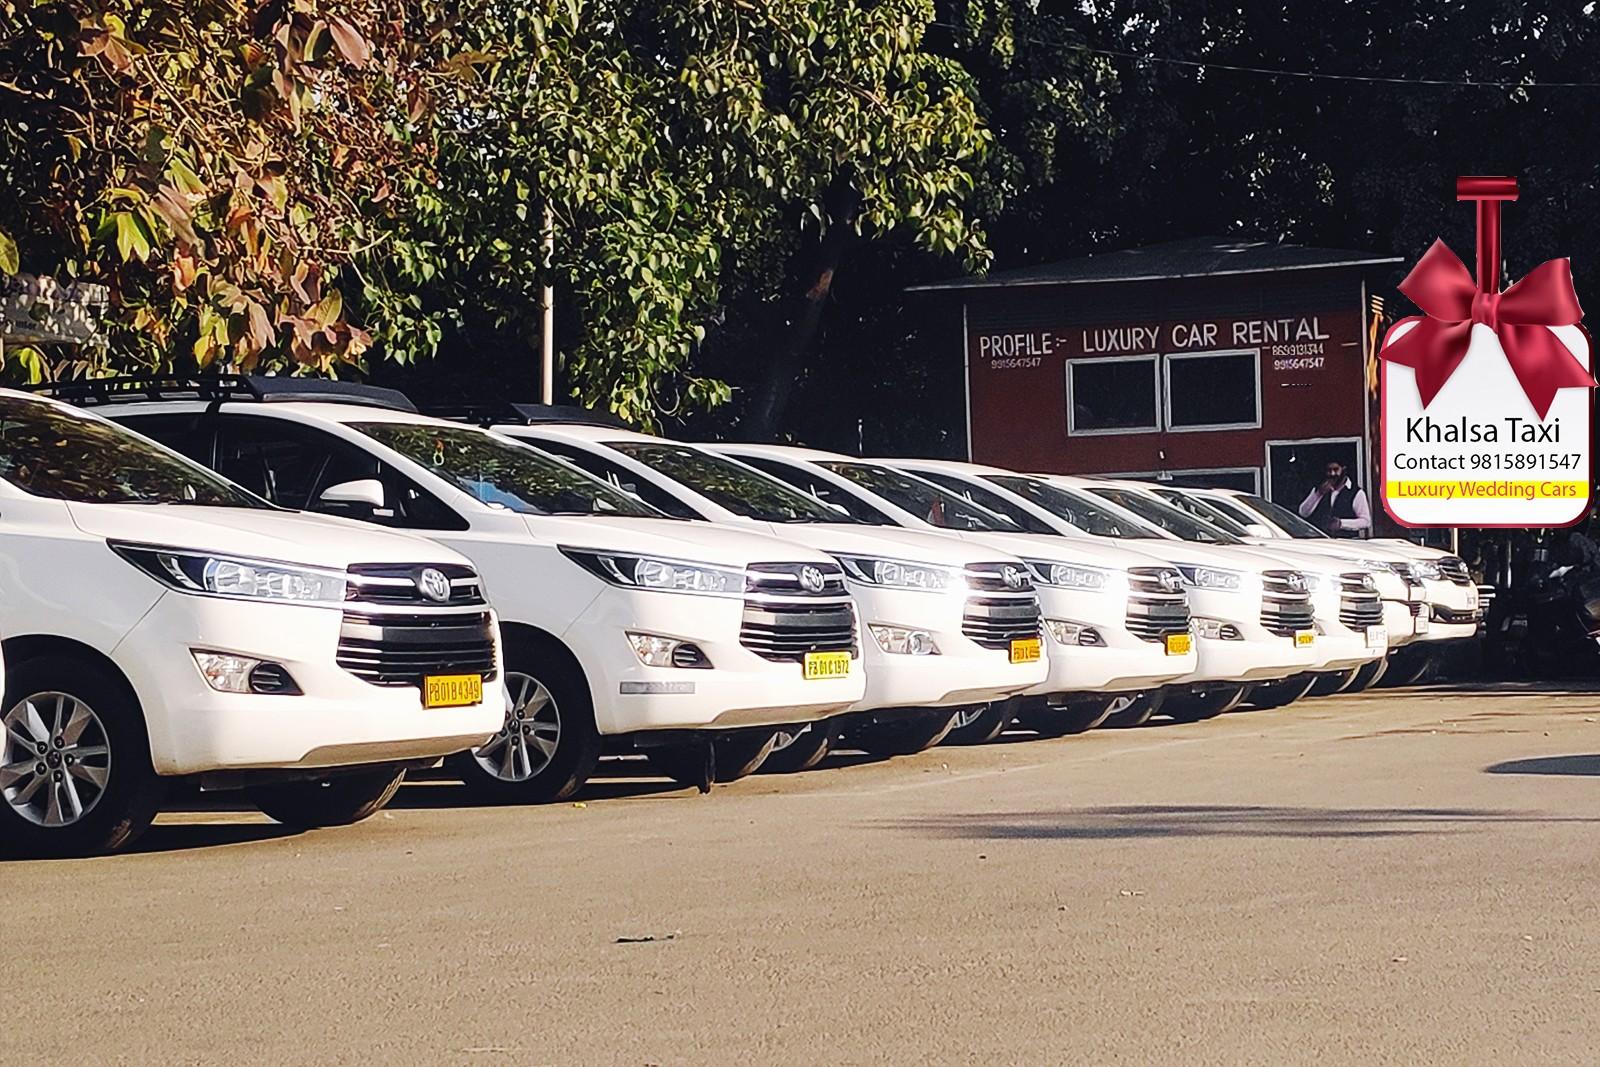 Innova crysta hire in Chandigarh, Toyota Crysta Rental In Chandigarh